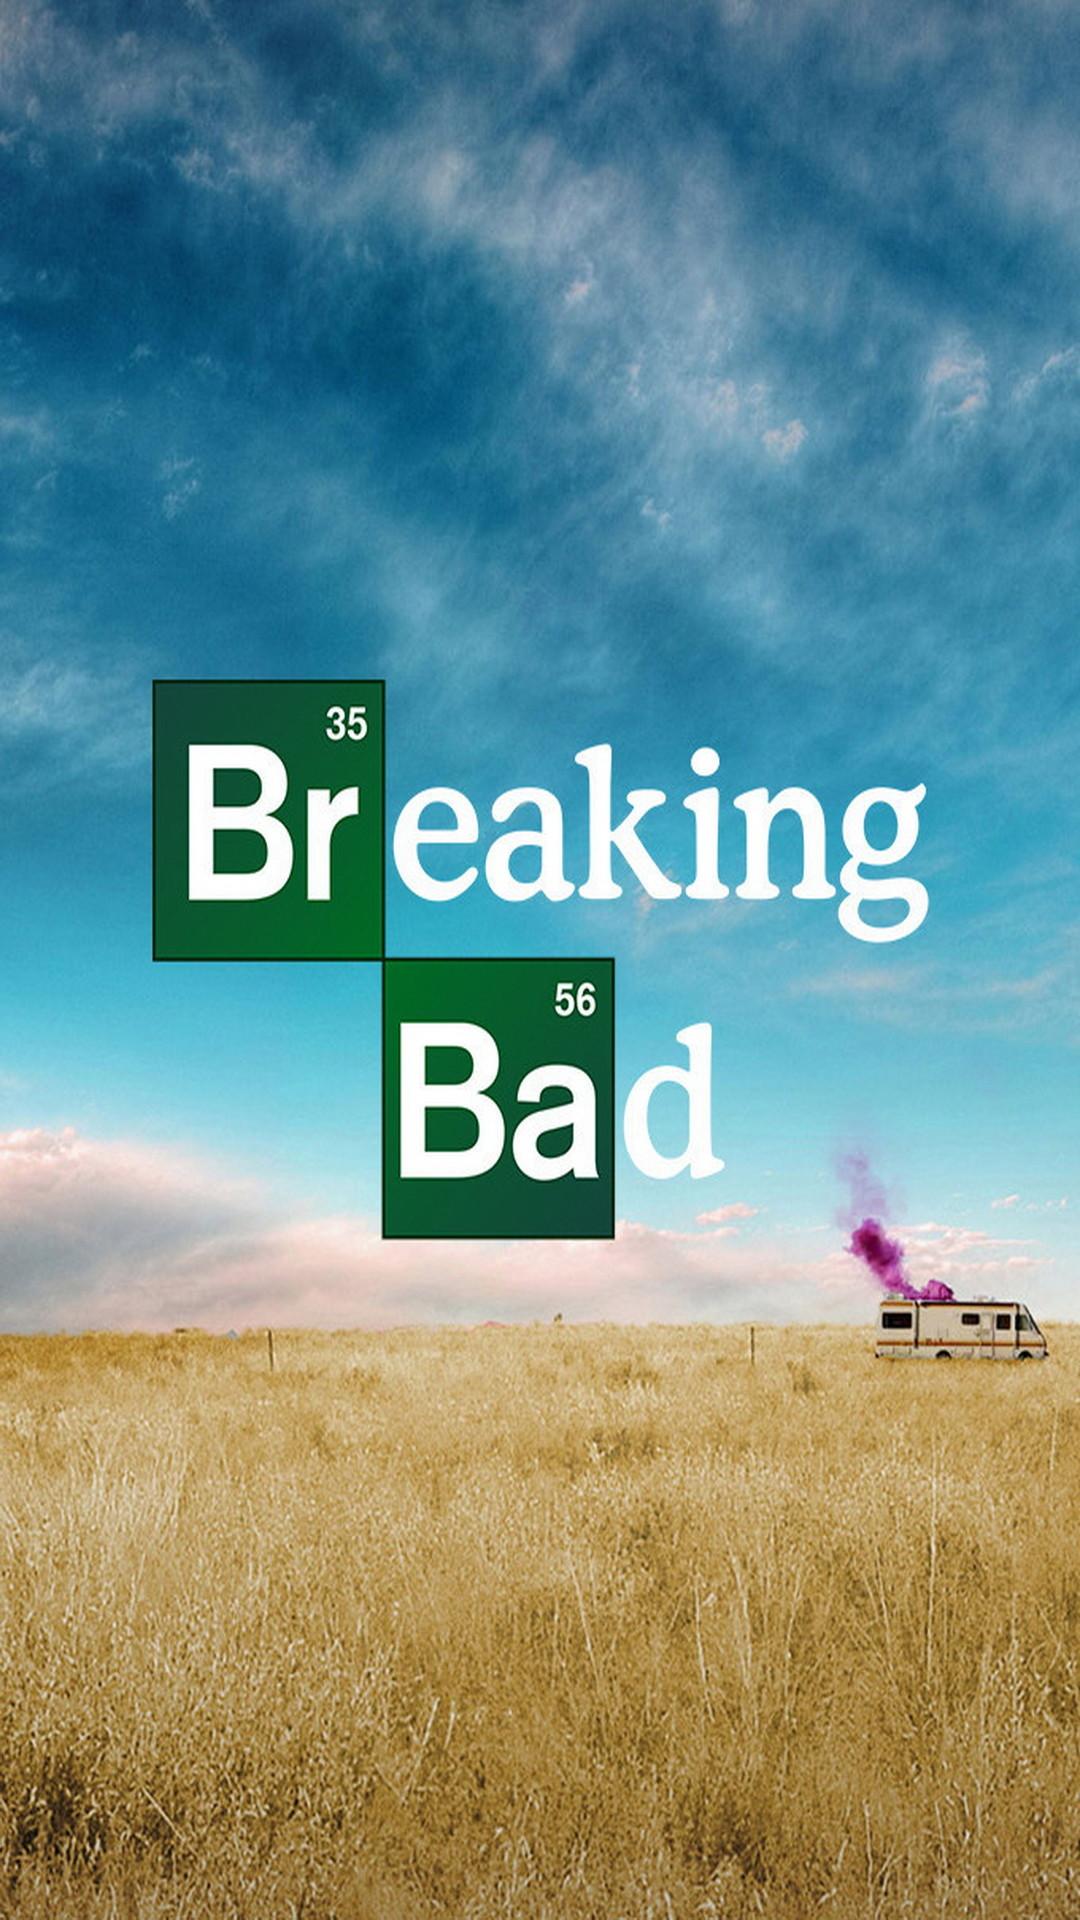 Breaking Bad Wallpaper 76 Images